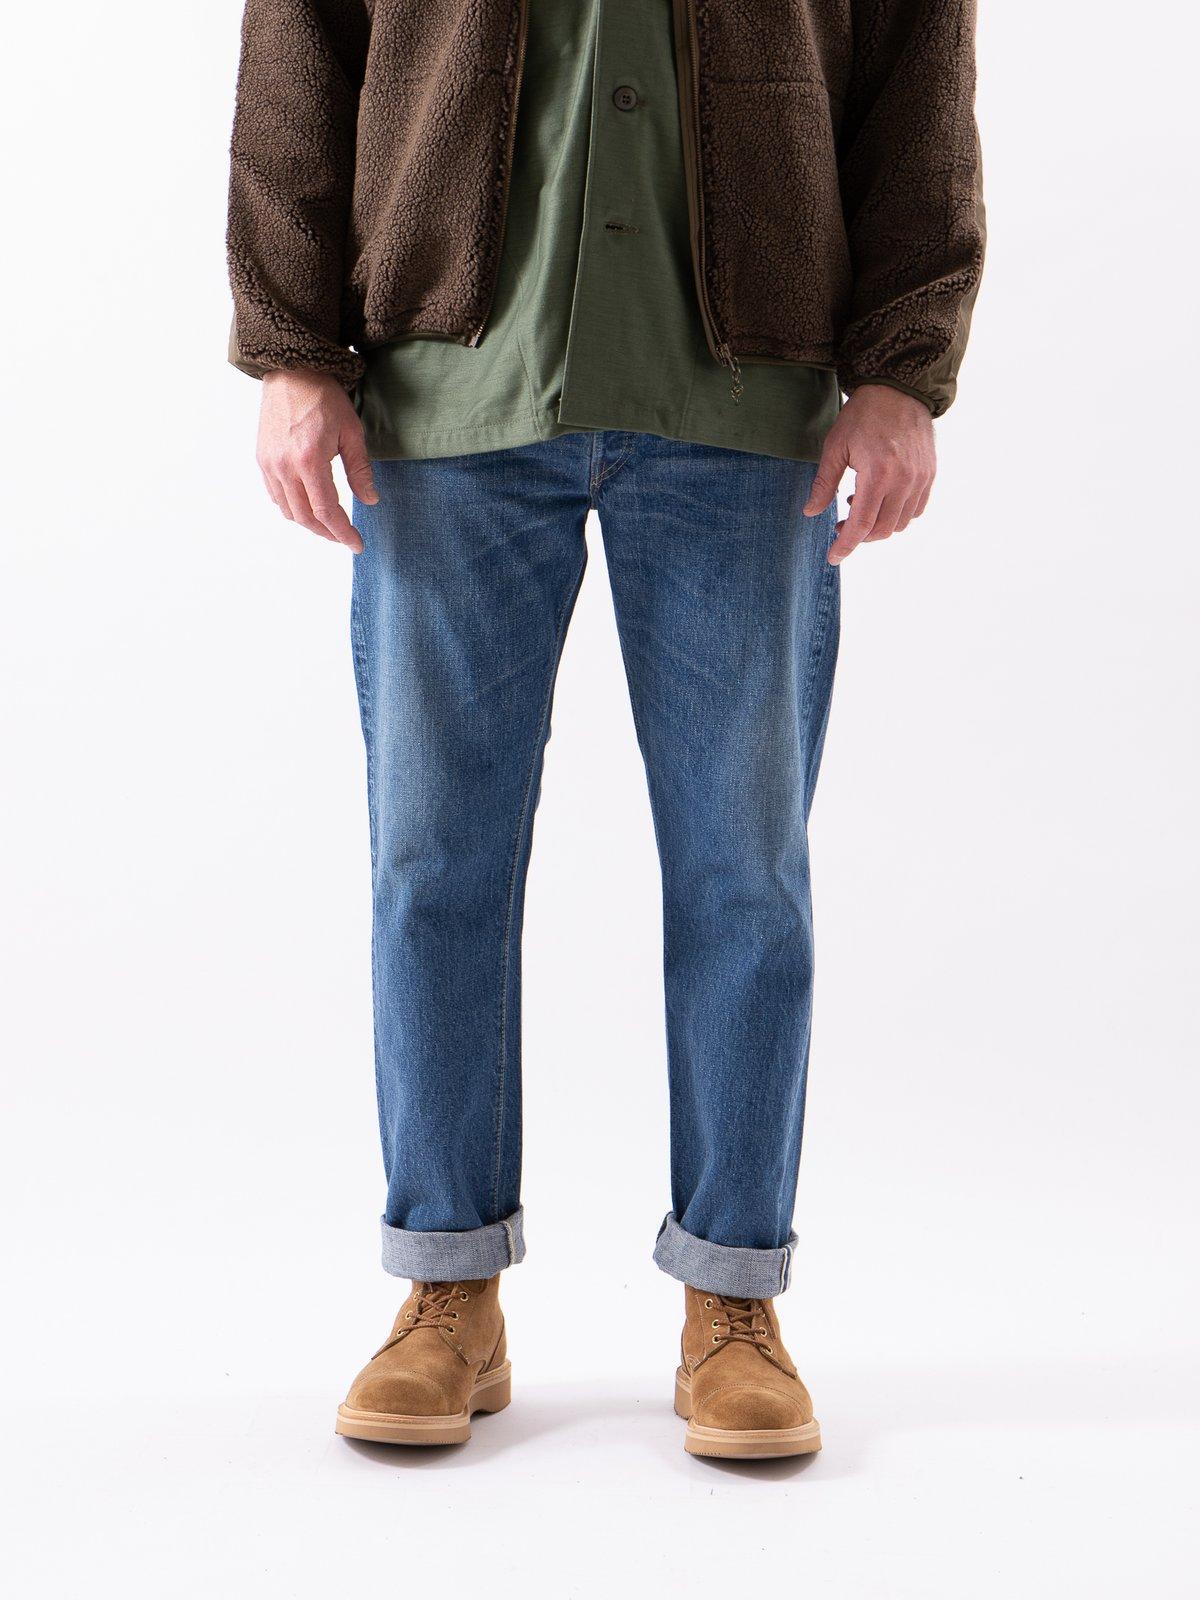 2 Year Wash 105 Standard 5 Pocket Jean - Image 2